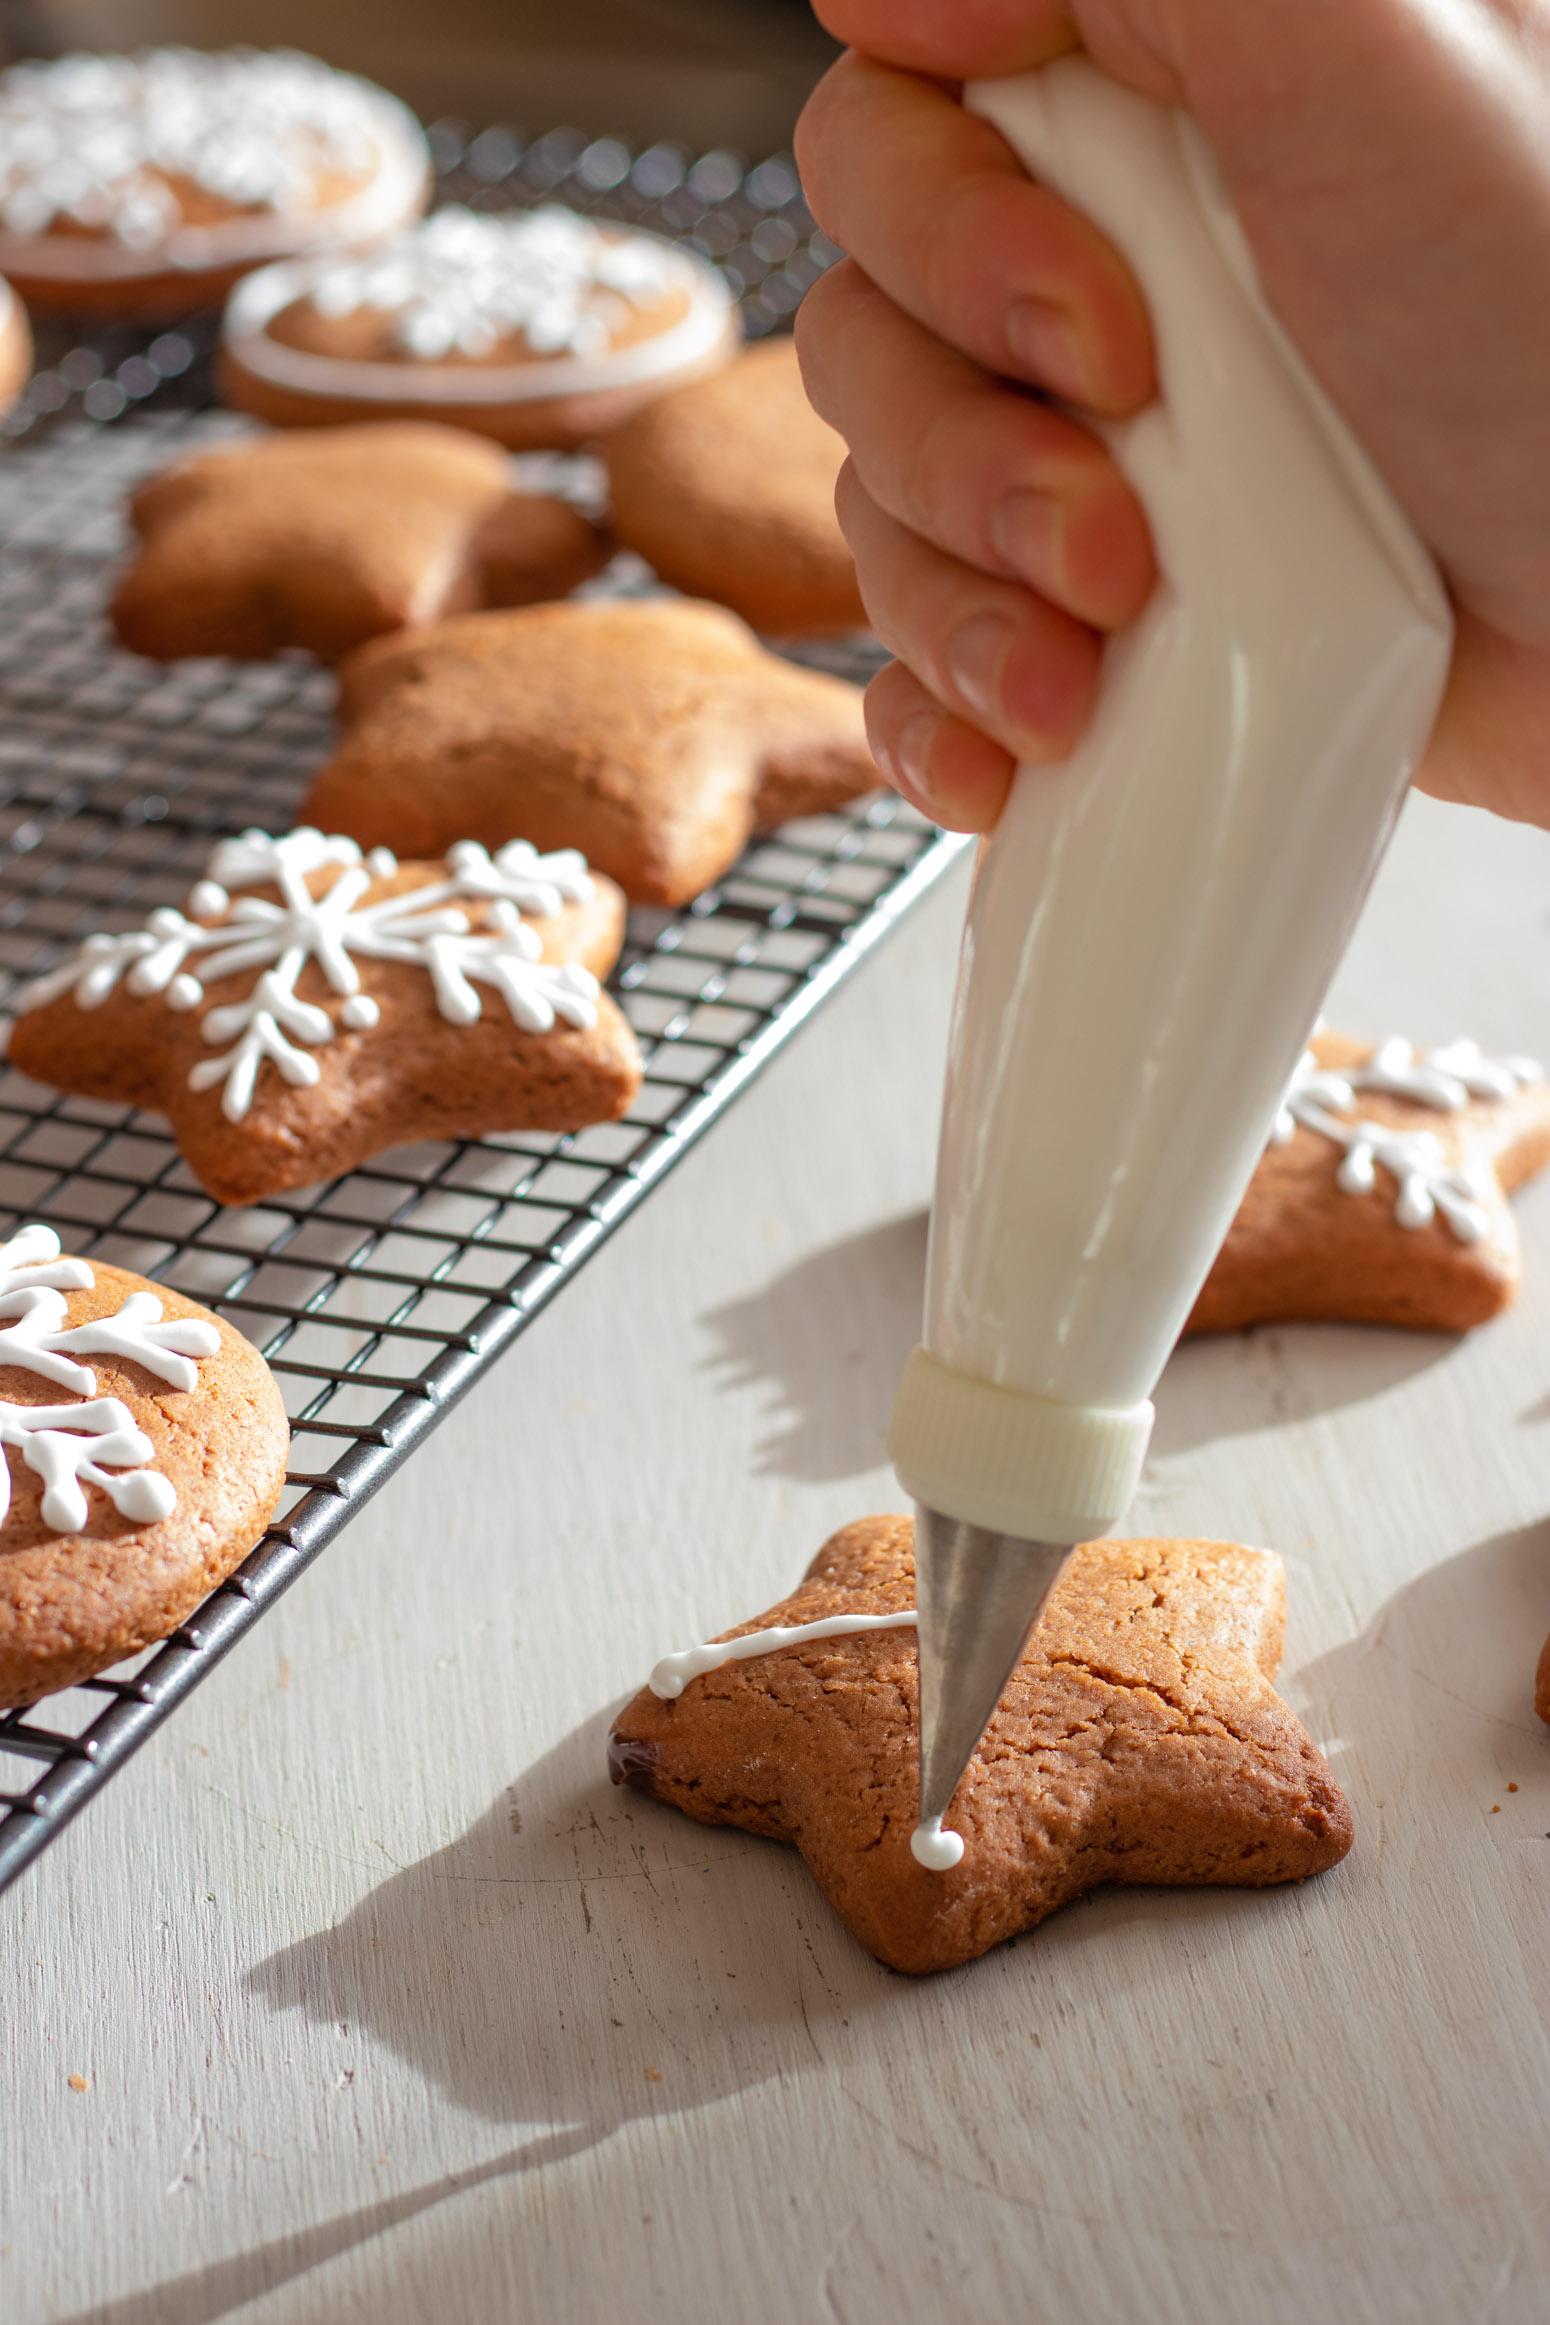 decorating-lebkuchen